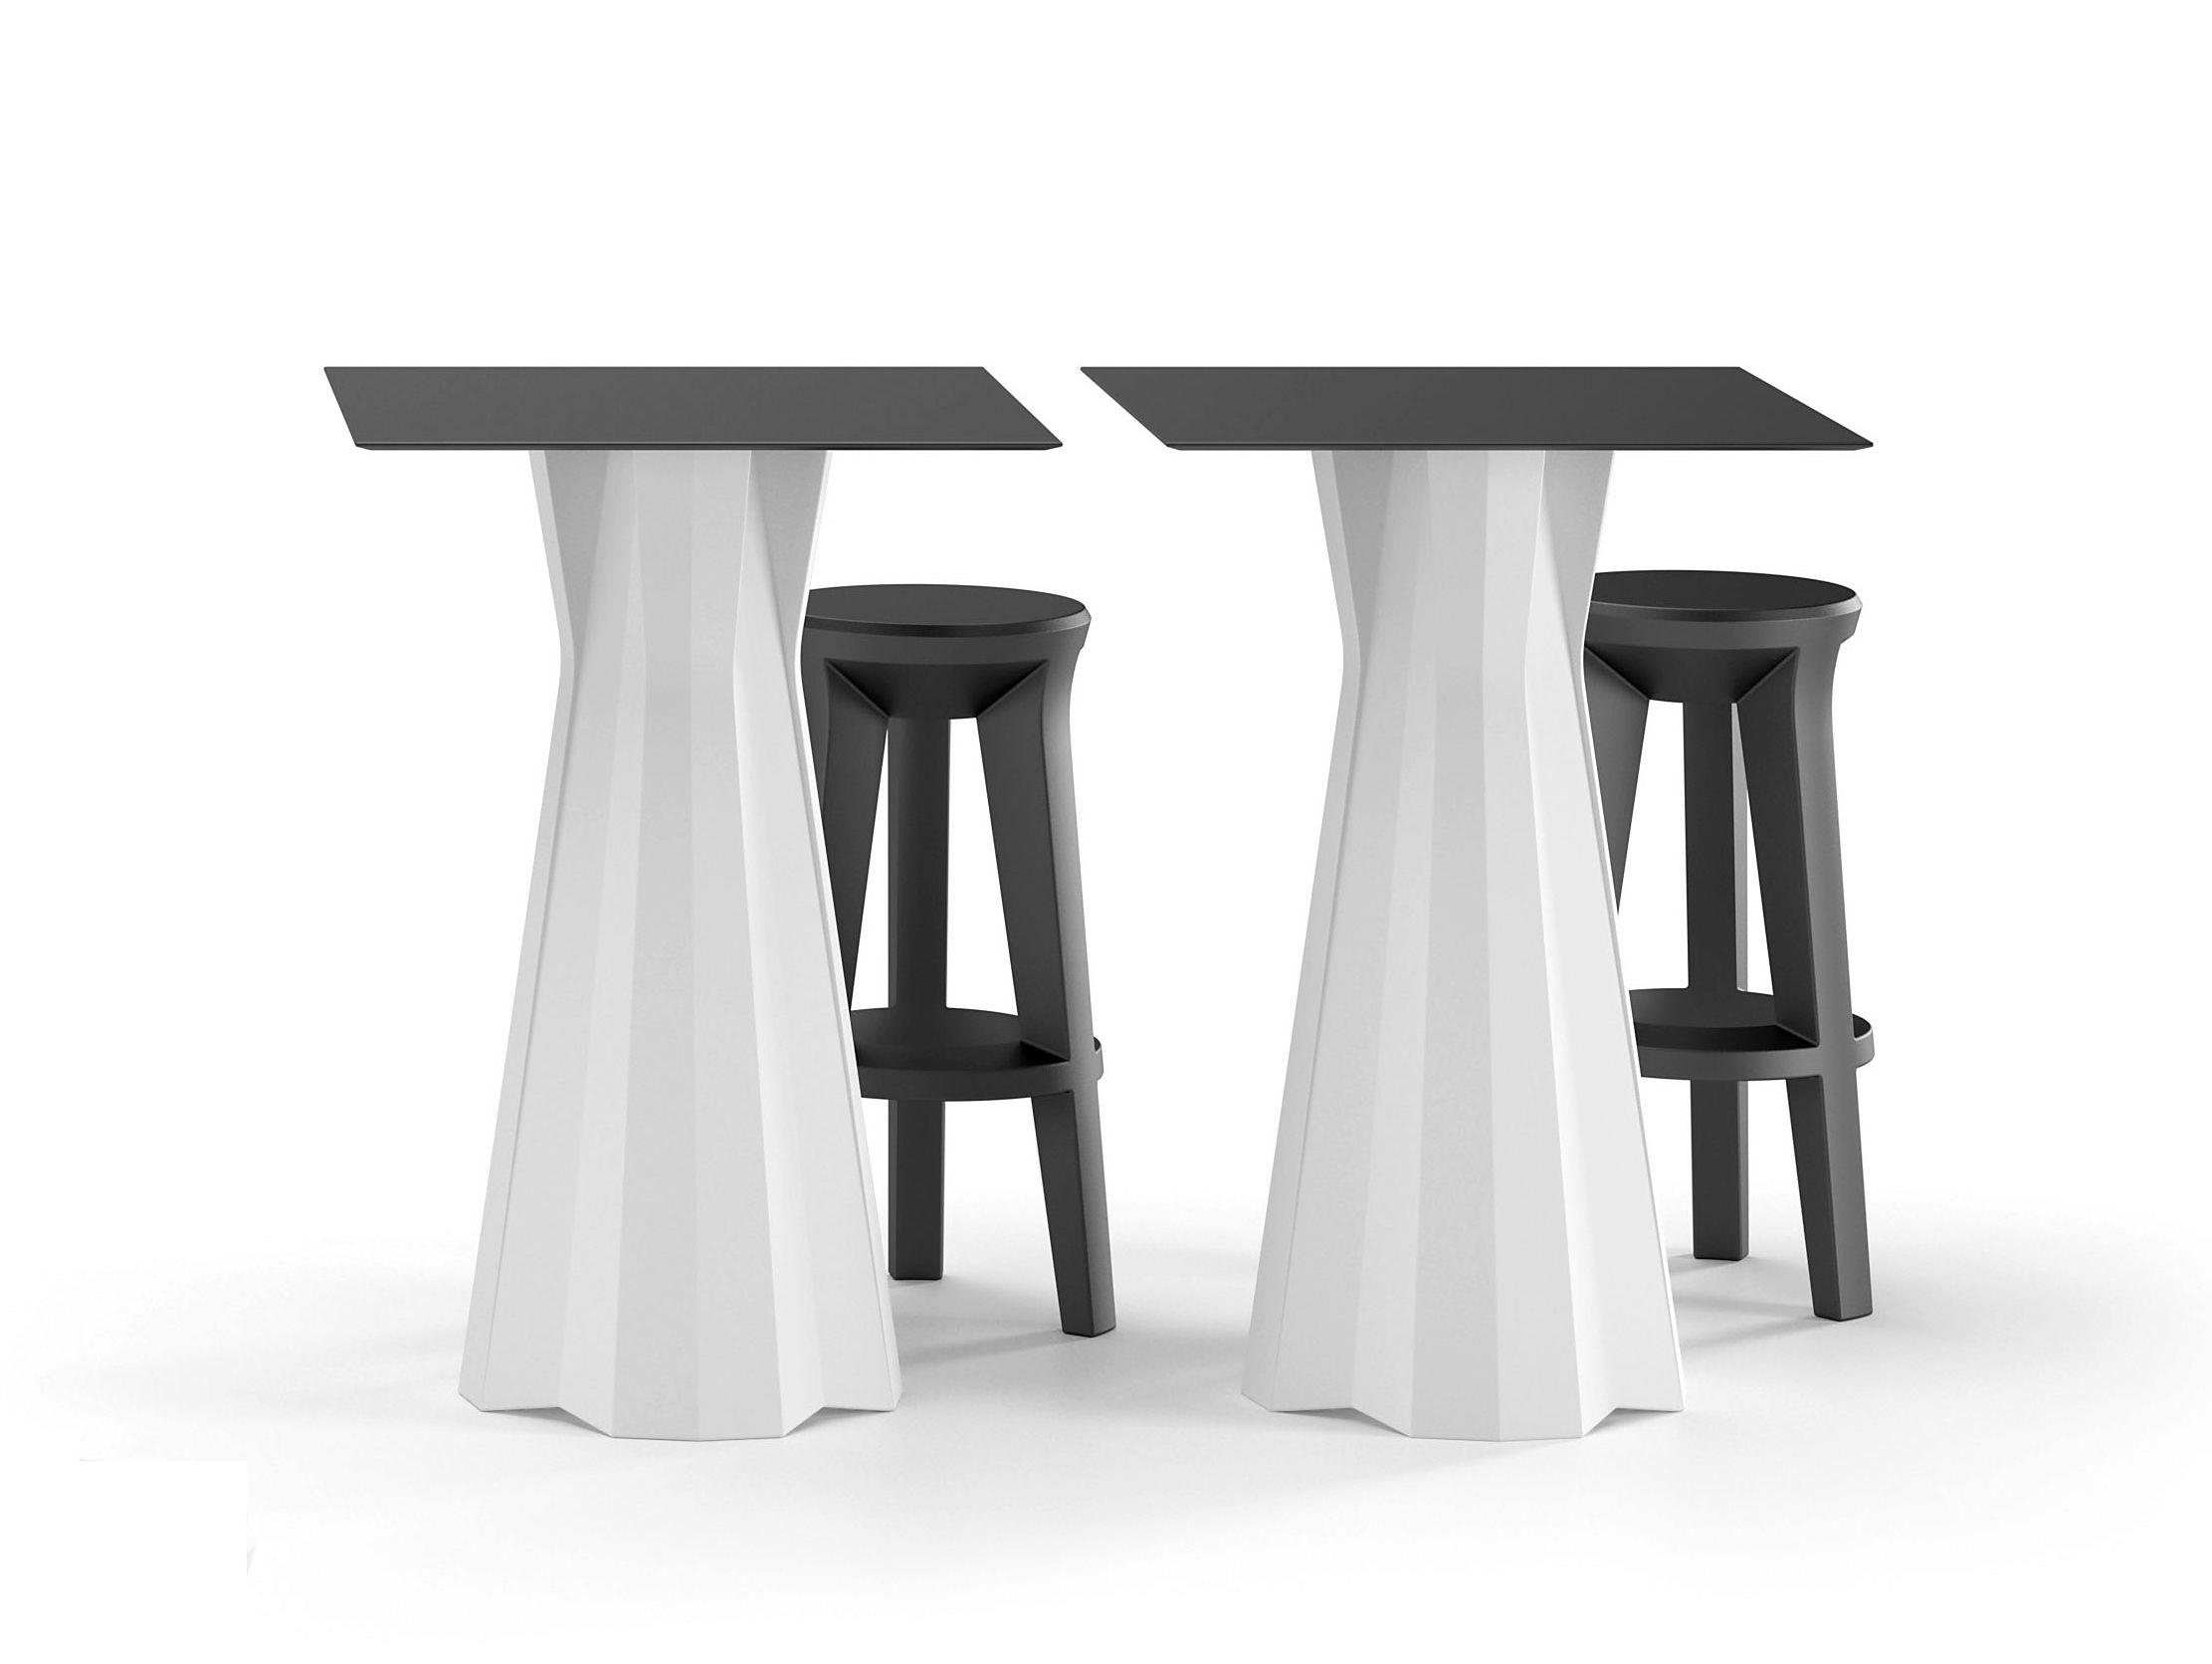 Tavolo Da Bar Per Cucina Sgabelli With Tavolo Da Bar Per